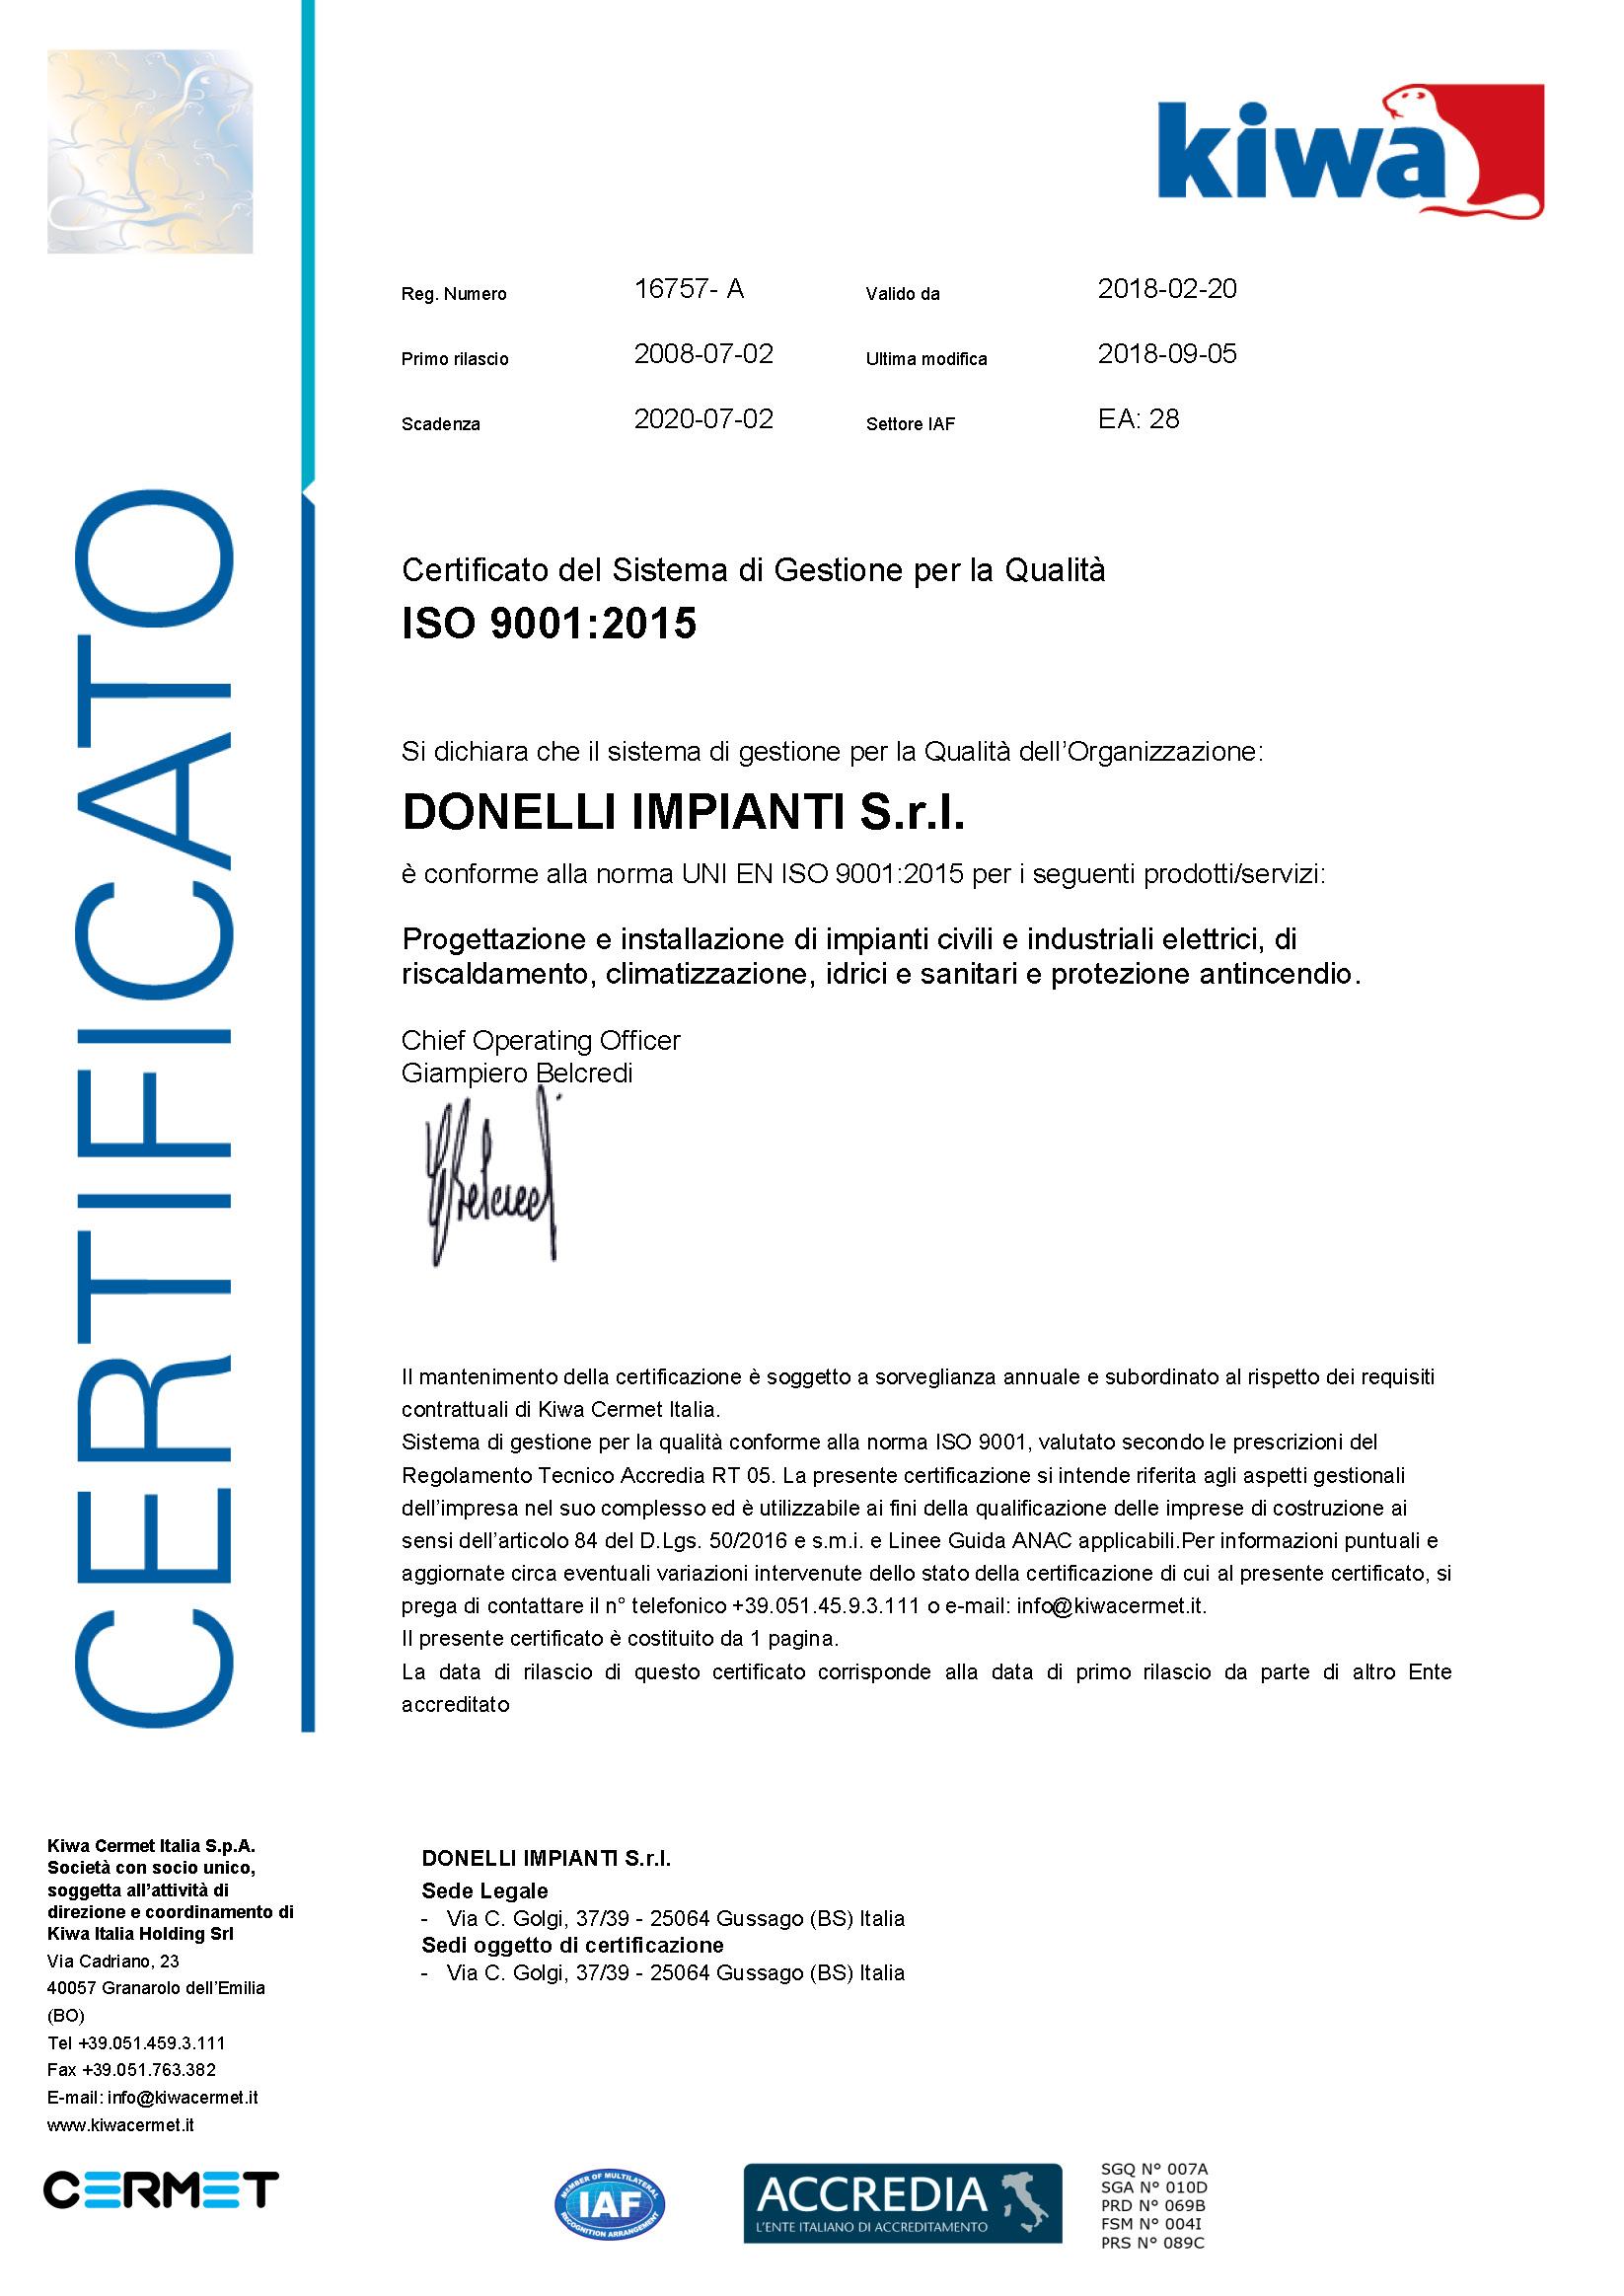 KIWA ISO 9001_2015 CERT_2018_16757_ITA_ENG_03